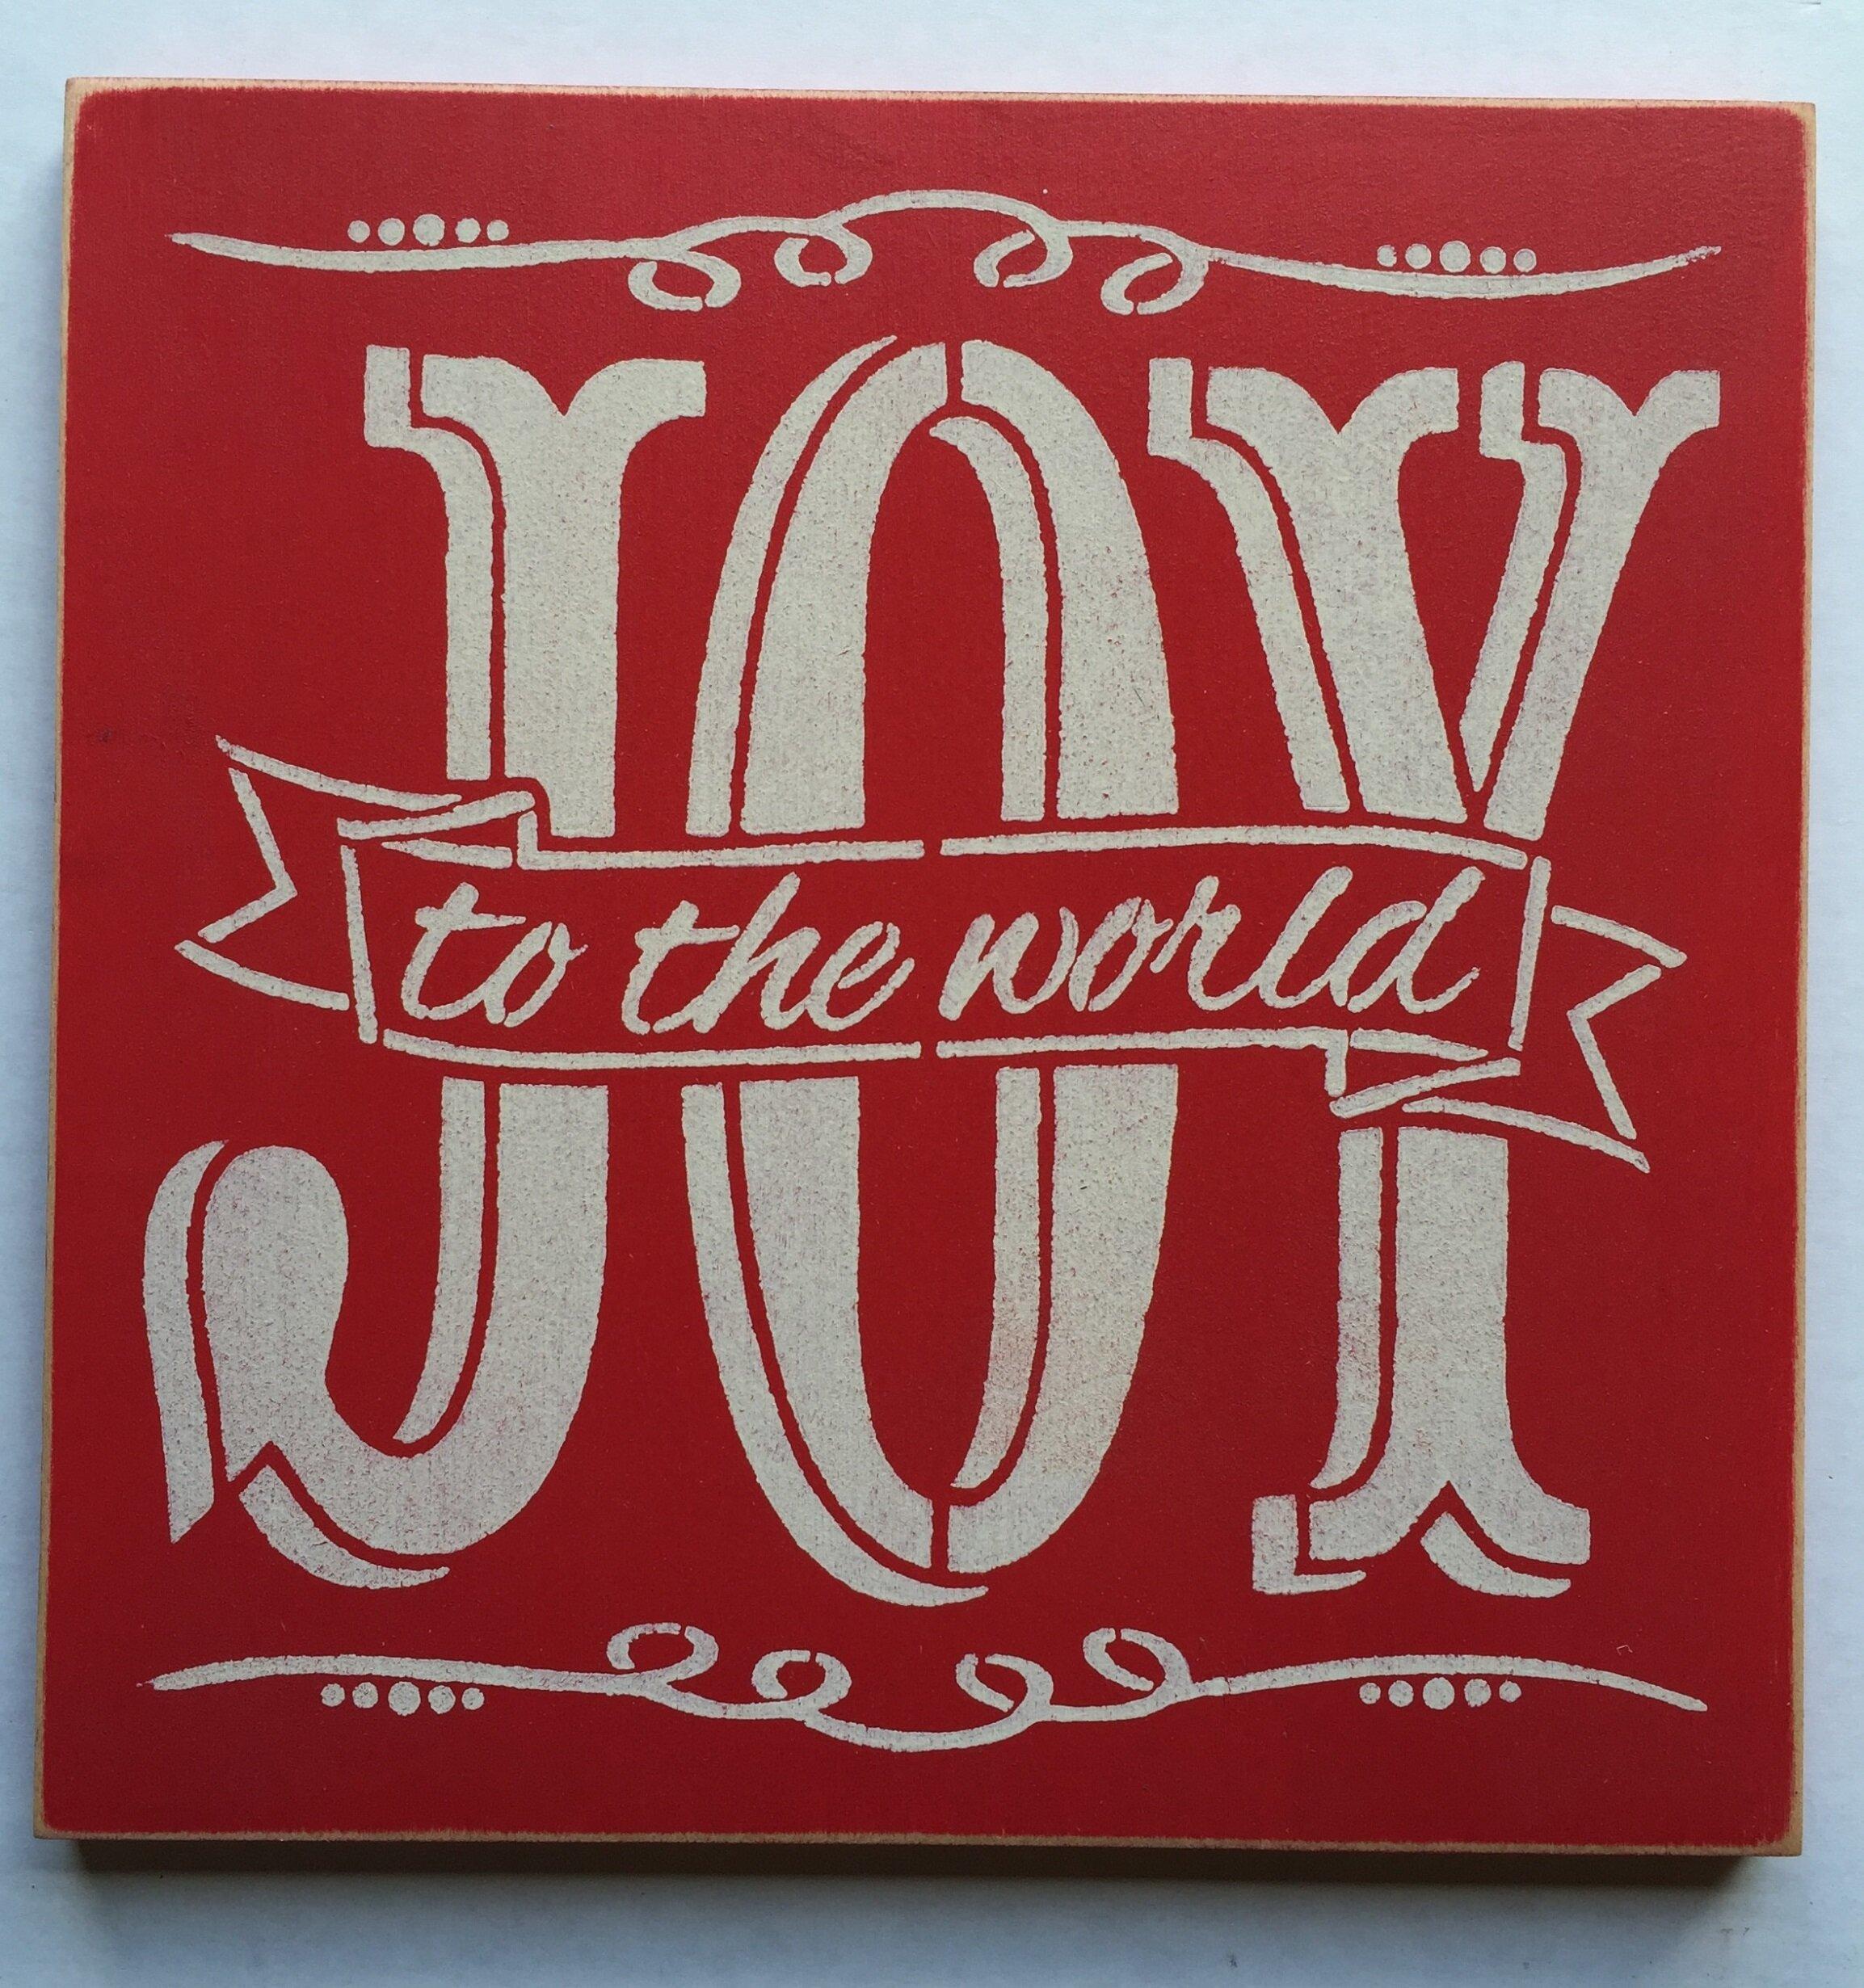 Sarassigns Joy To The World Textual Art On Wood Wayfair